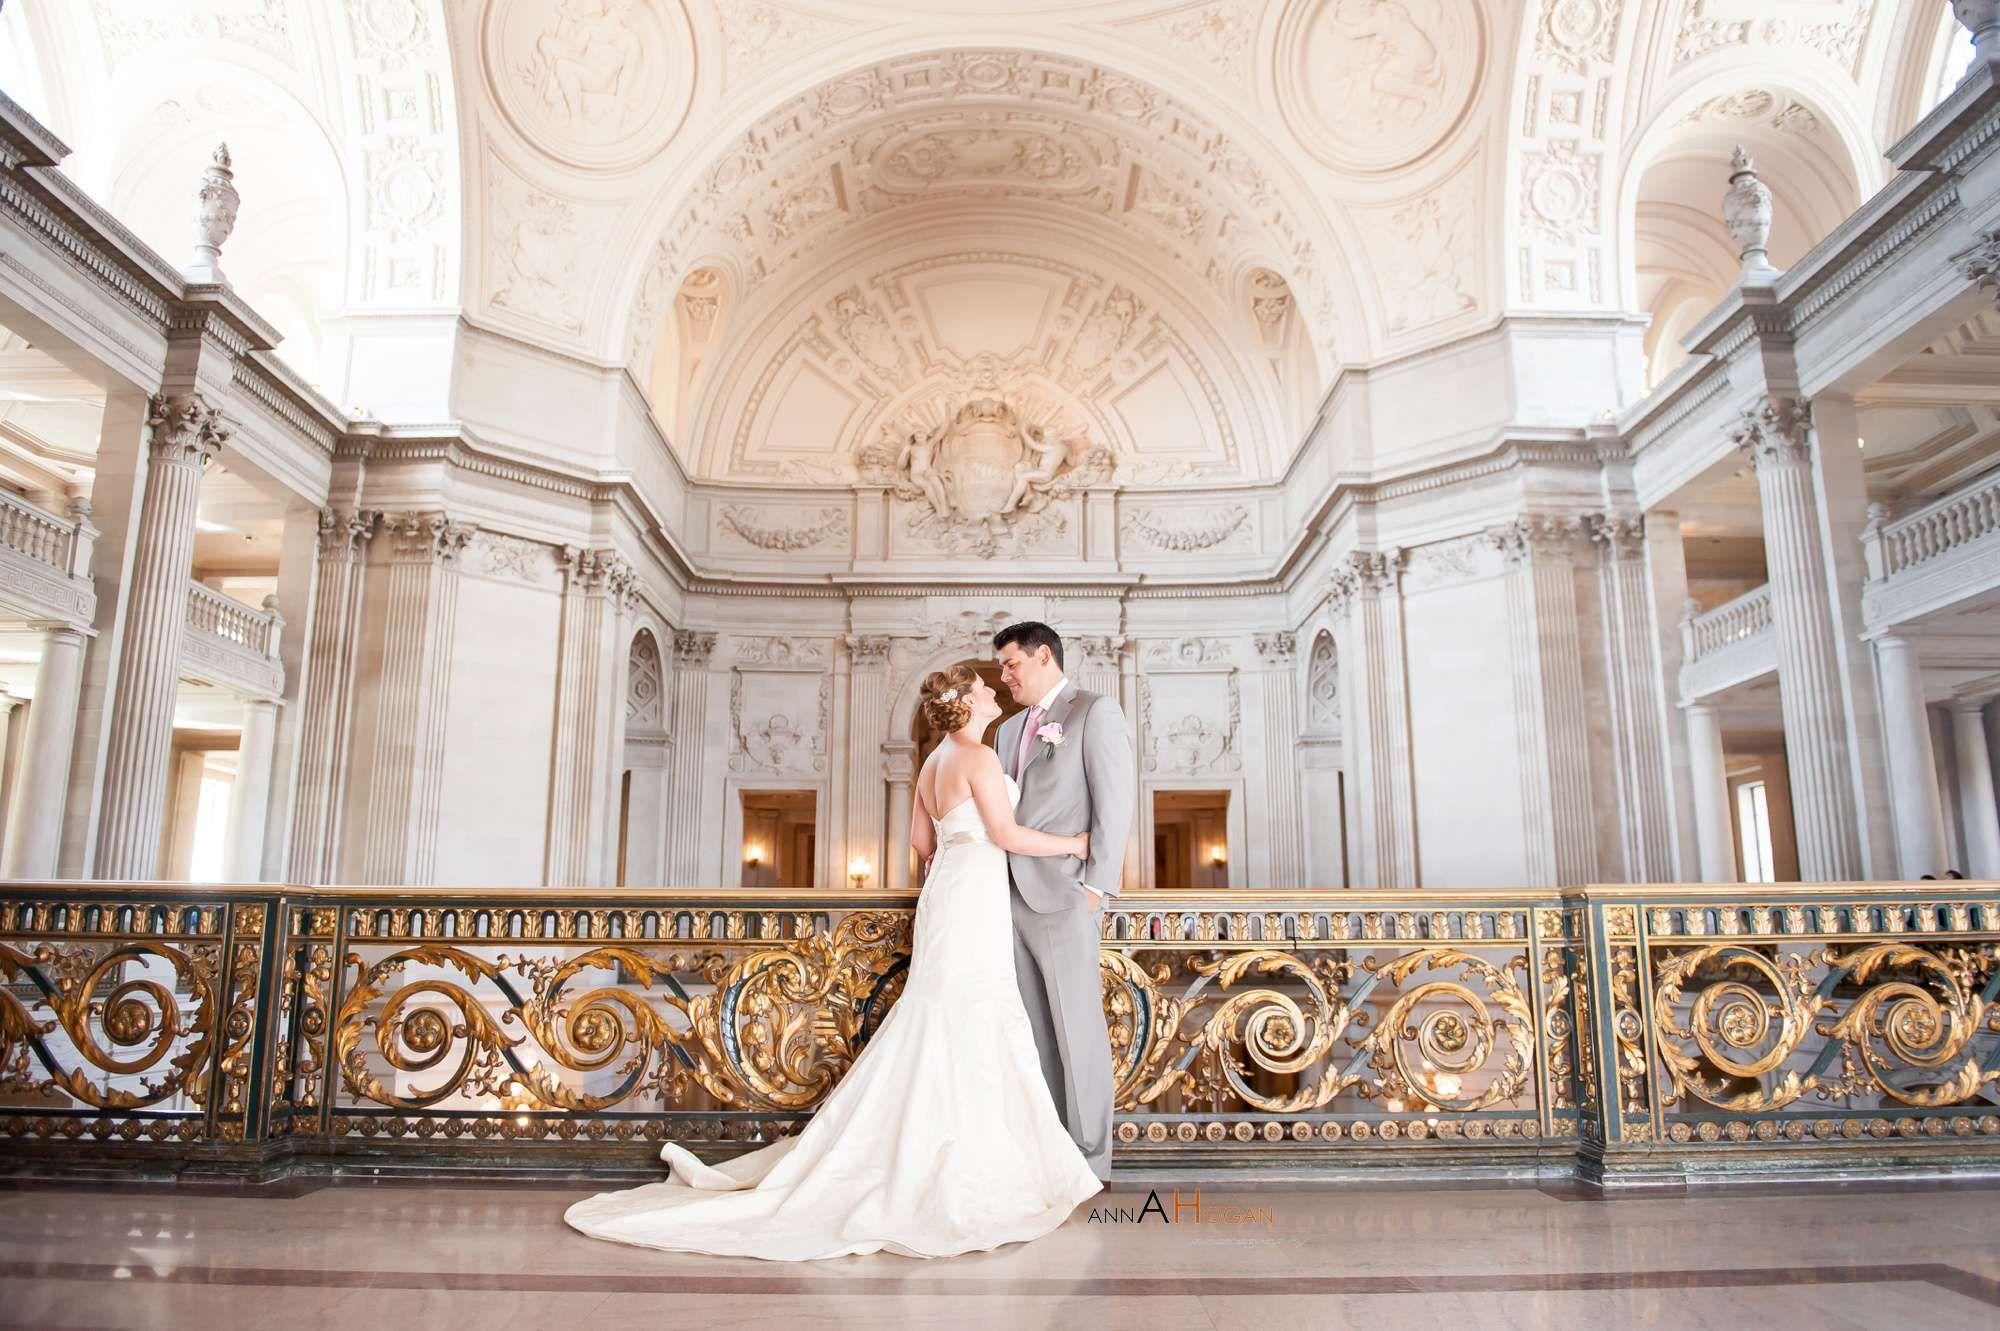 Mayors Balcony Wedding City Hall Sf City Hall Wedding Wedding San Francisco San Francisco City Hall Wedding Photography